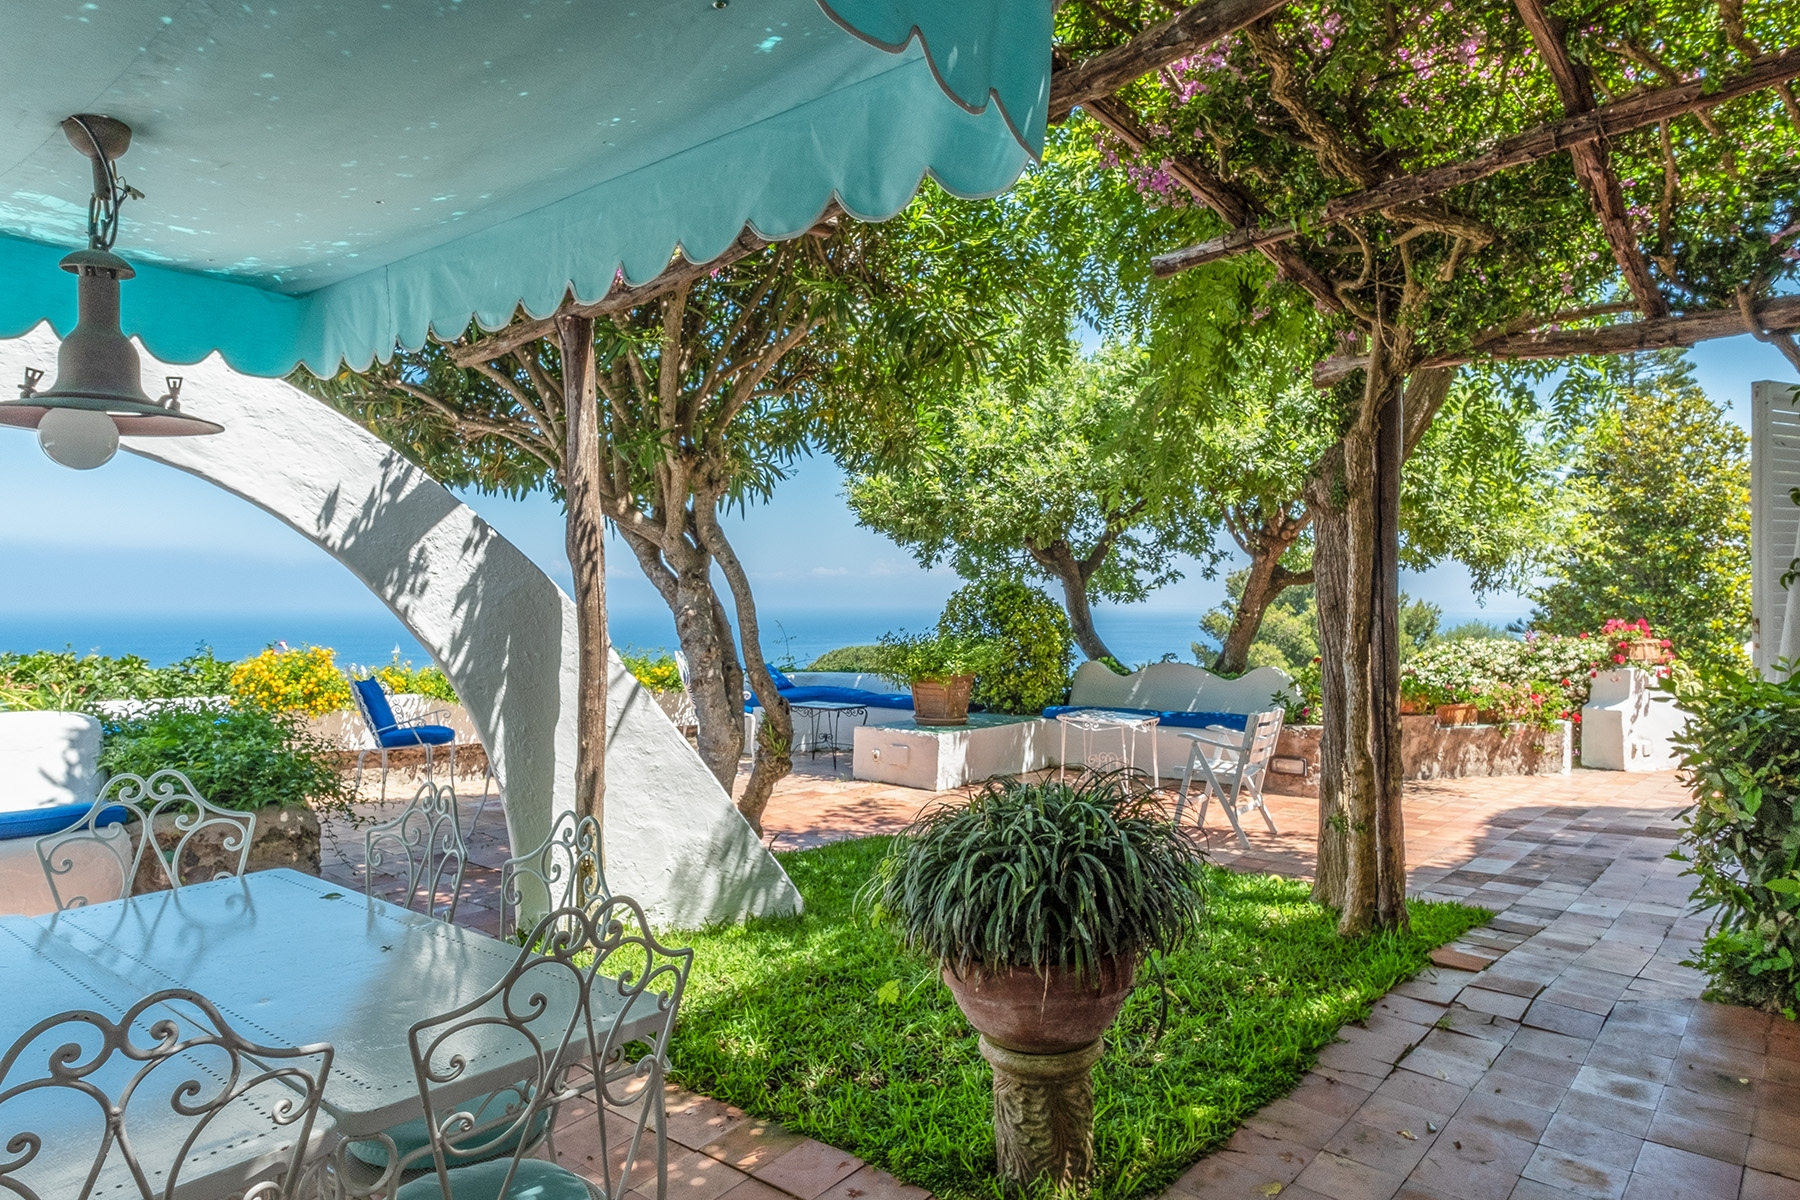 Villa in Vendita a Ischia: 5 locali, 206 mq - Foto 15